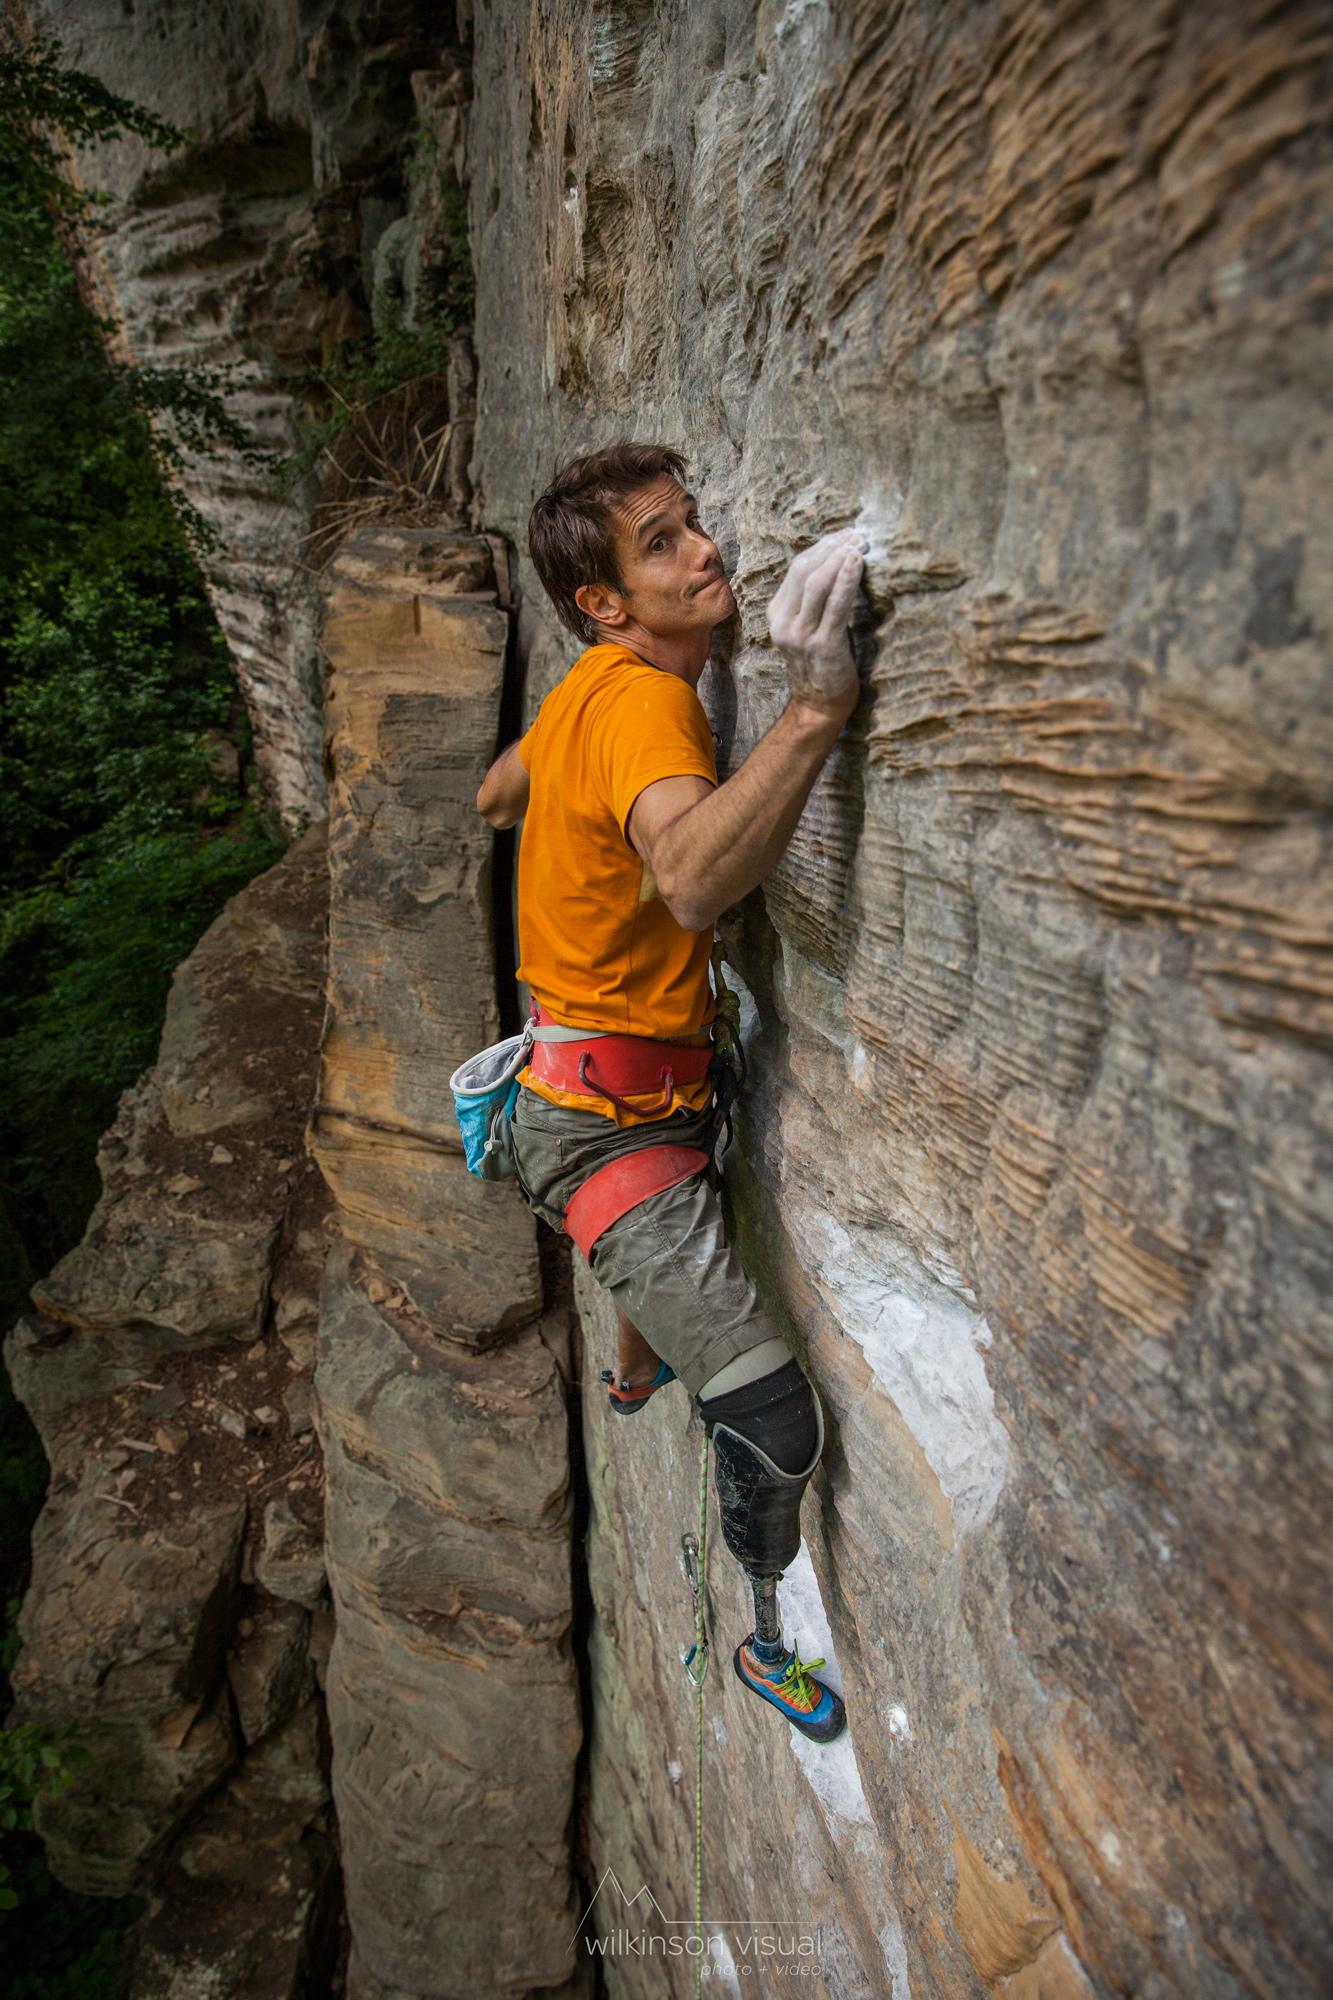 demartino-climbing-9896-Edit.jpg